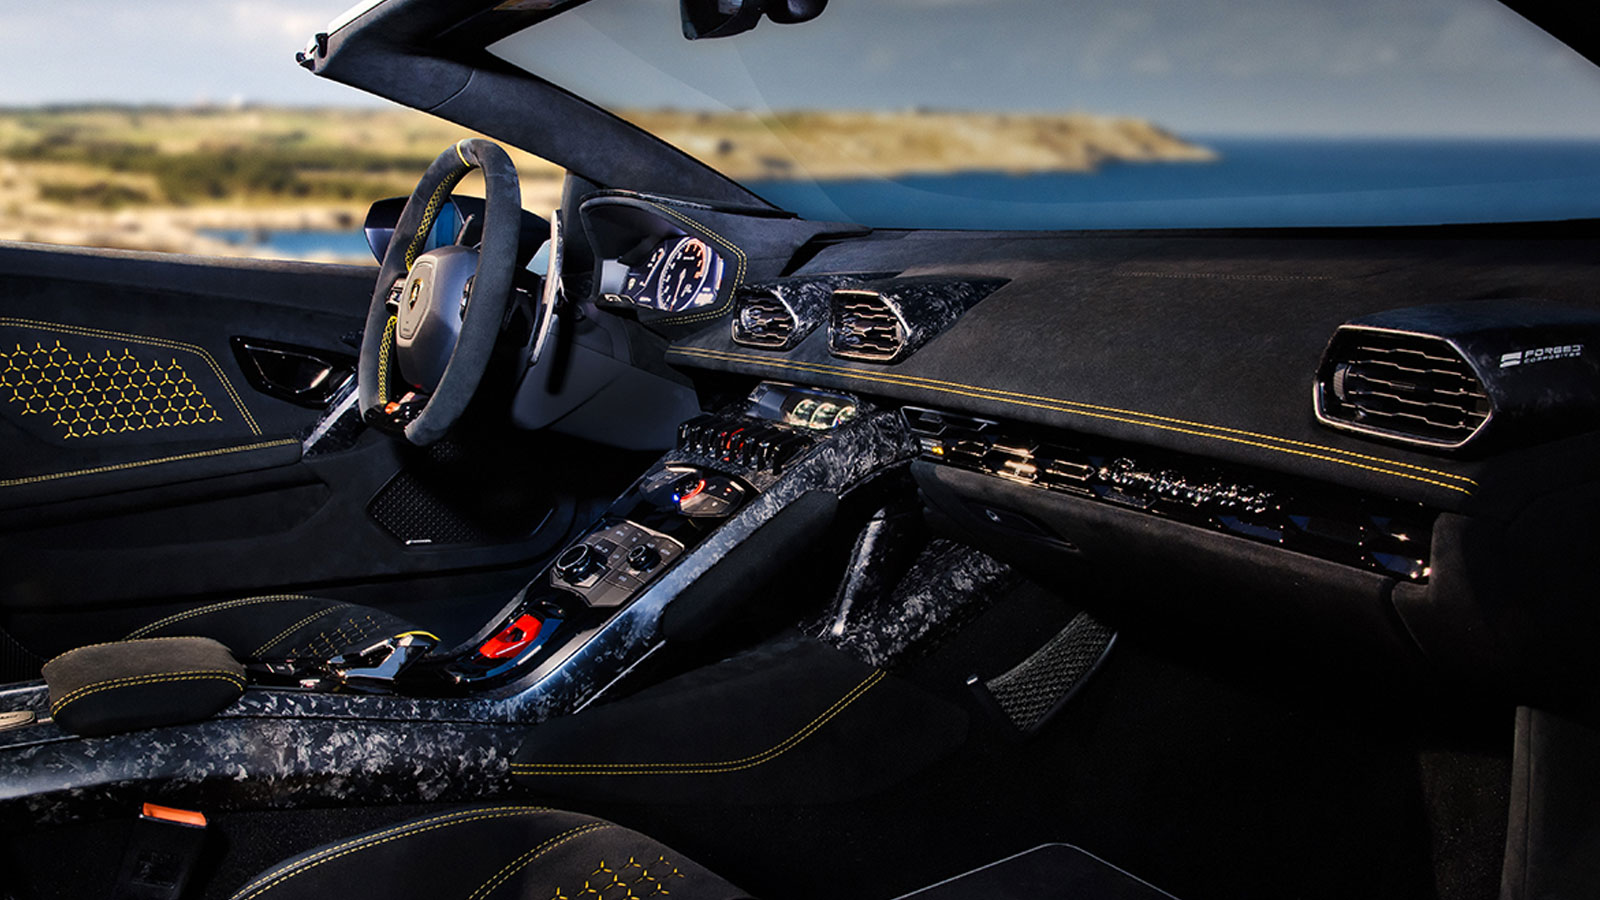 Lamborghini Huracan Performante Spyder - Vivid Technology image 10